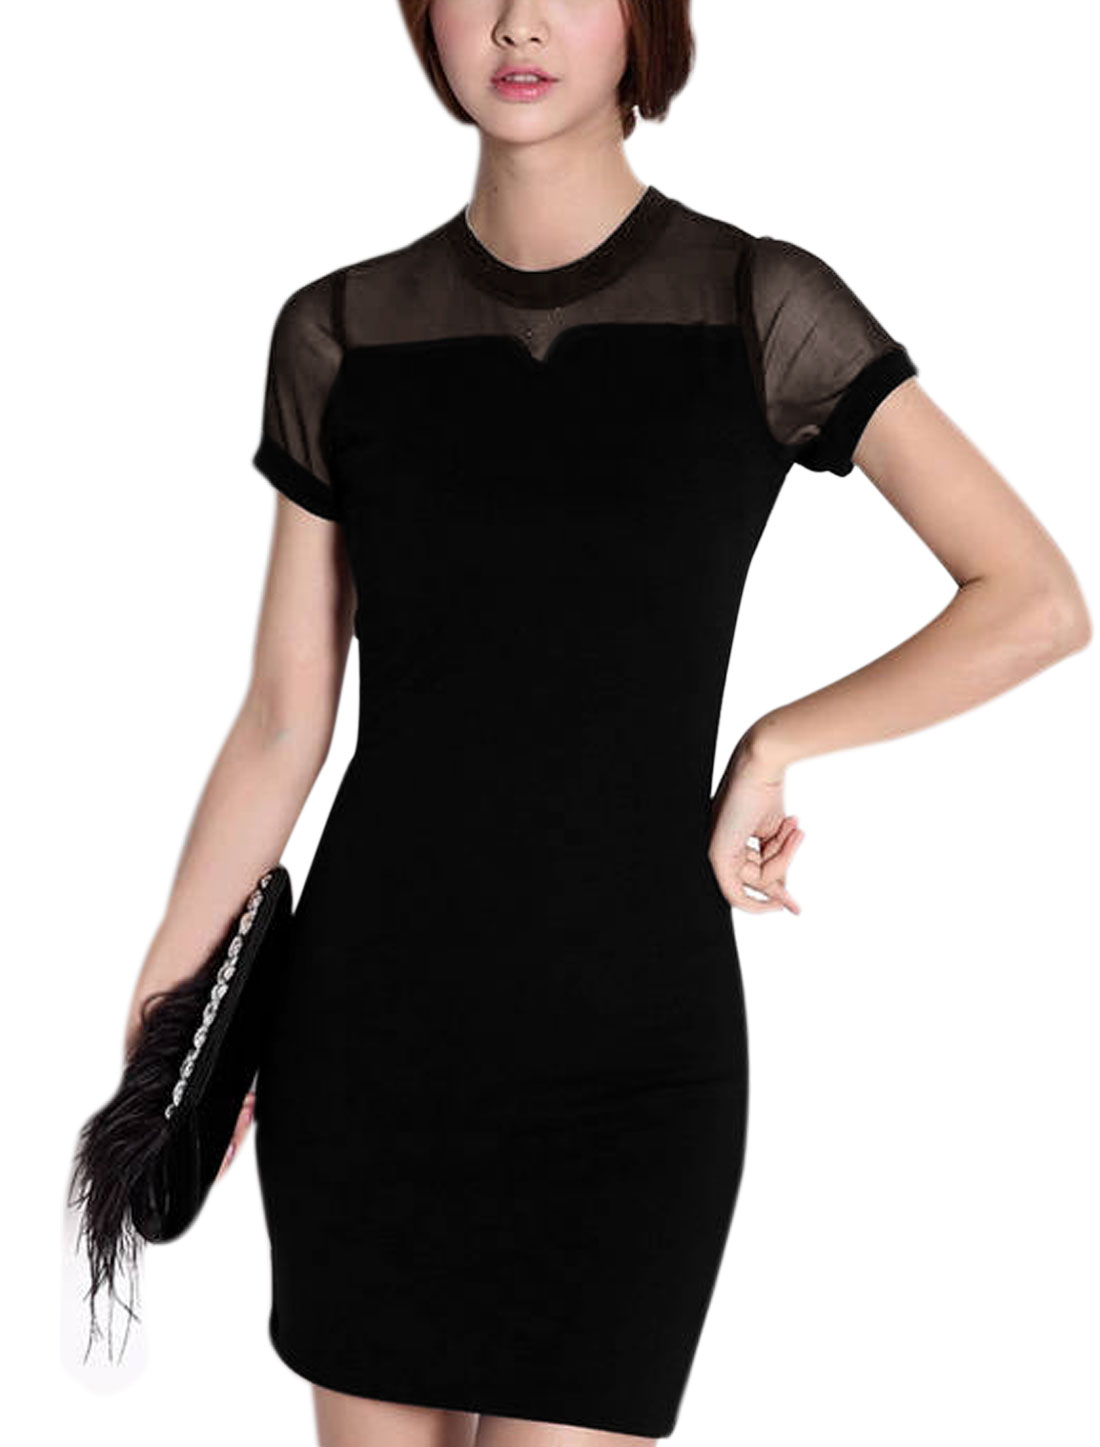 Women Mesh Panel Back Zipper Above Knee Sweet Sheathy Dress Black XS